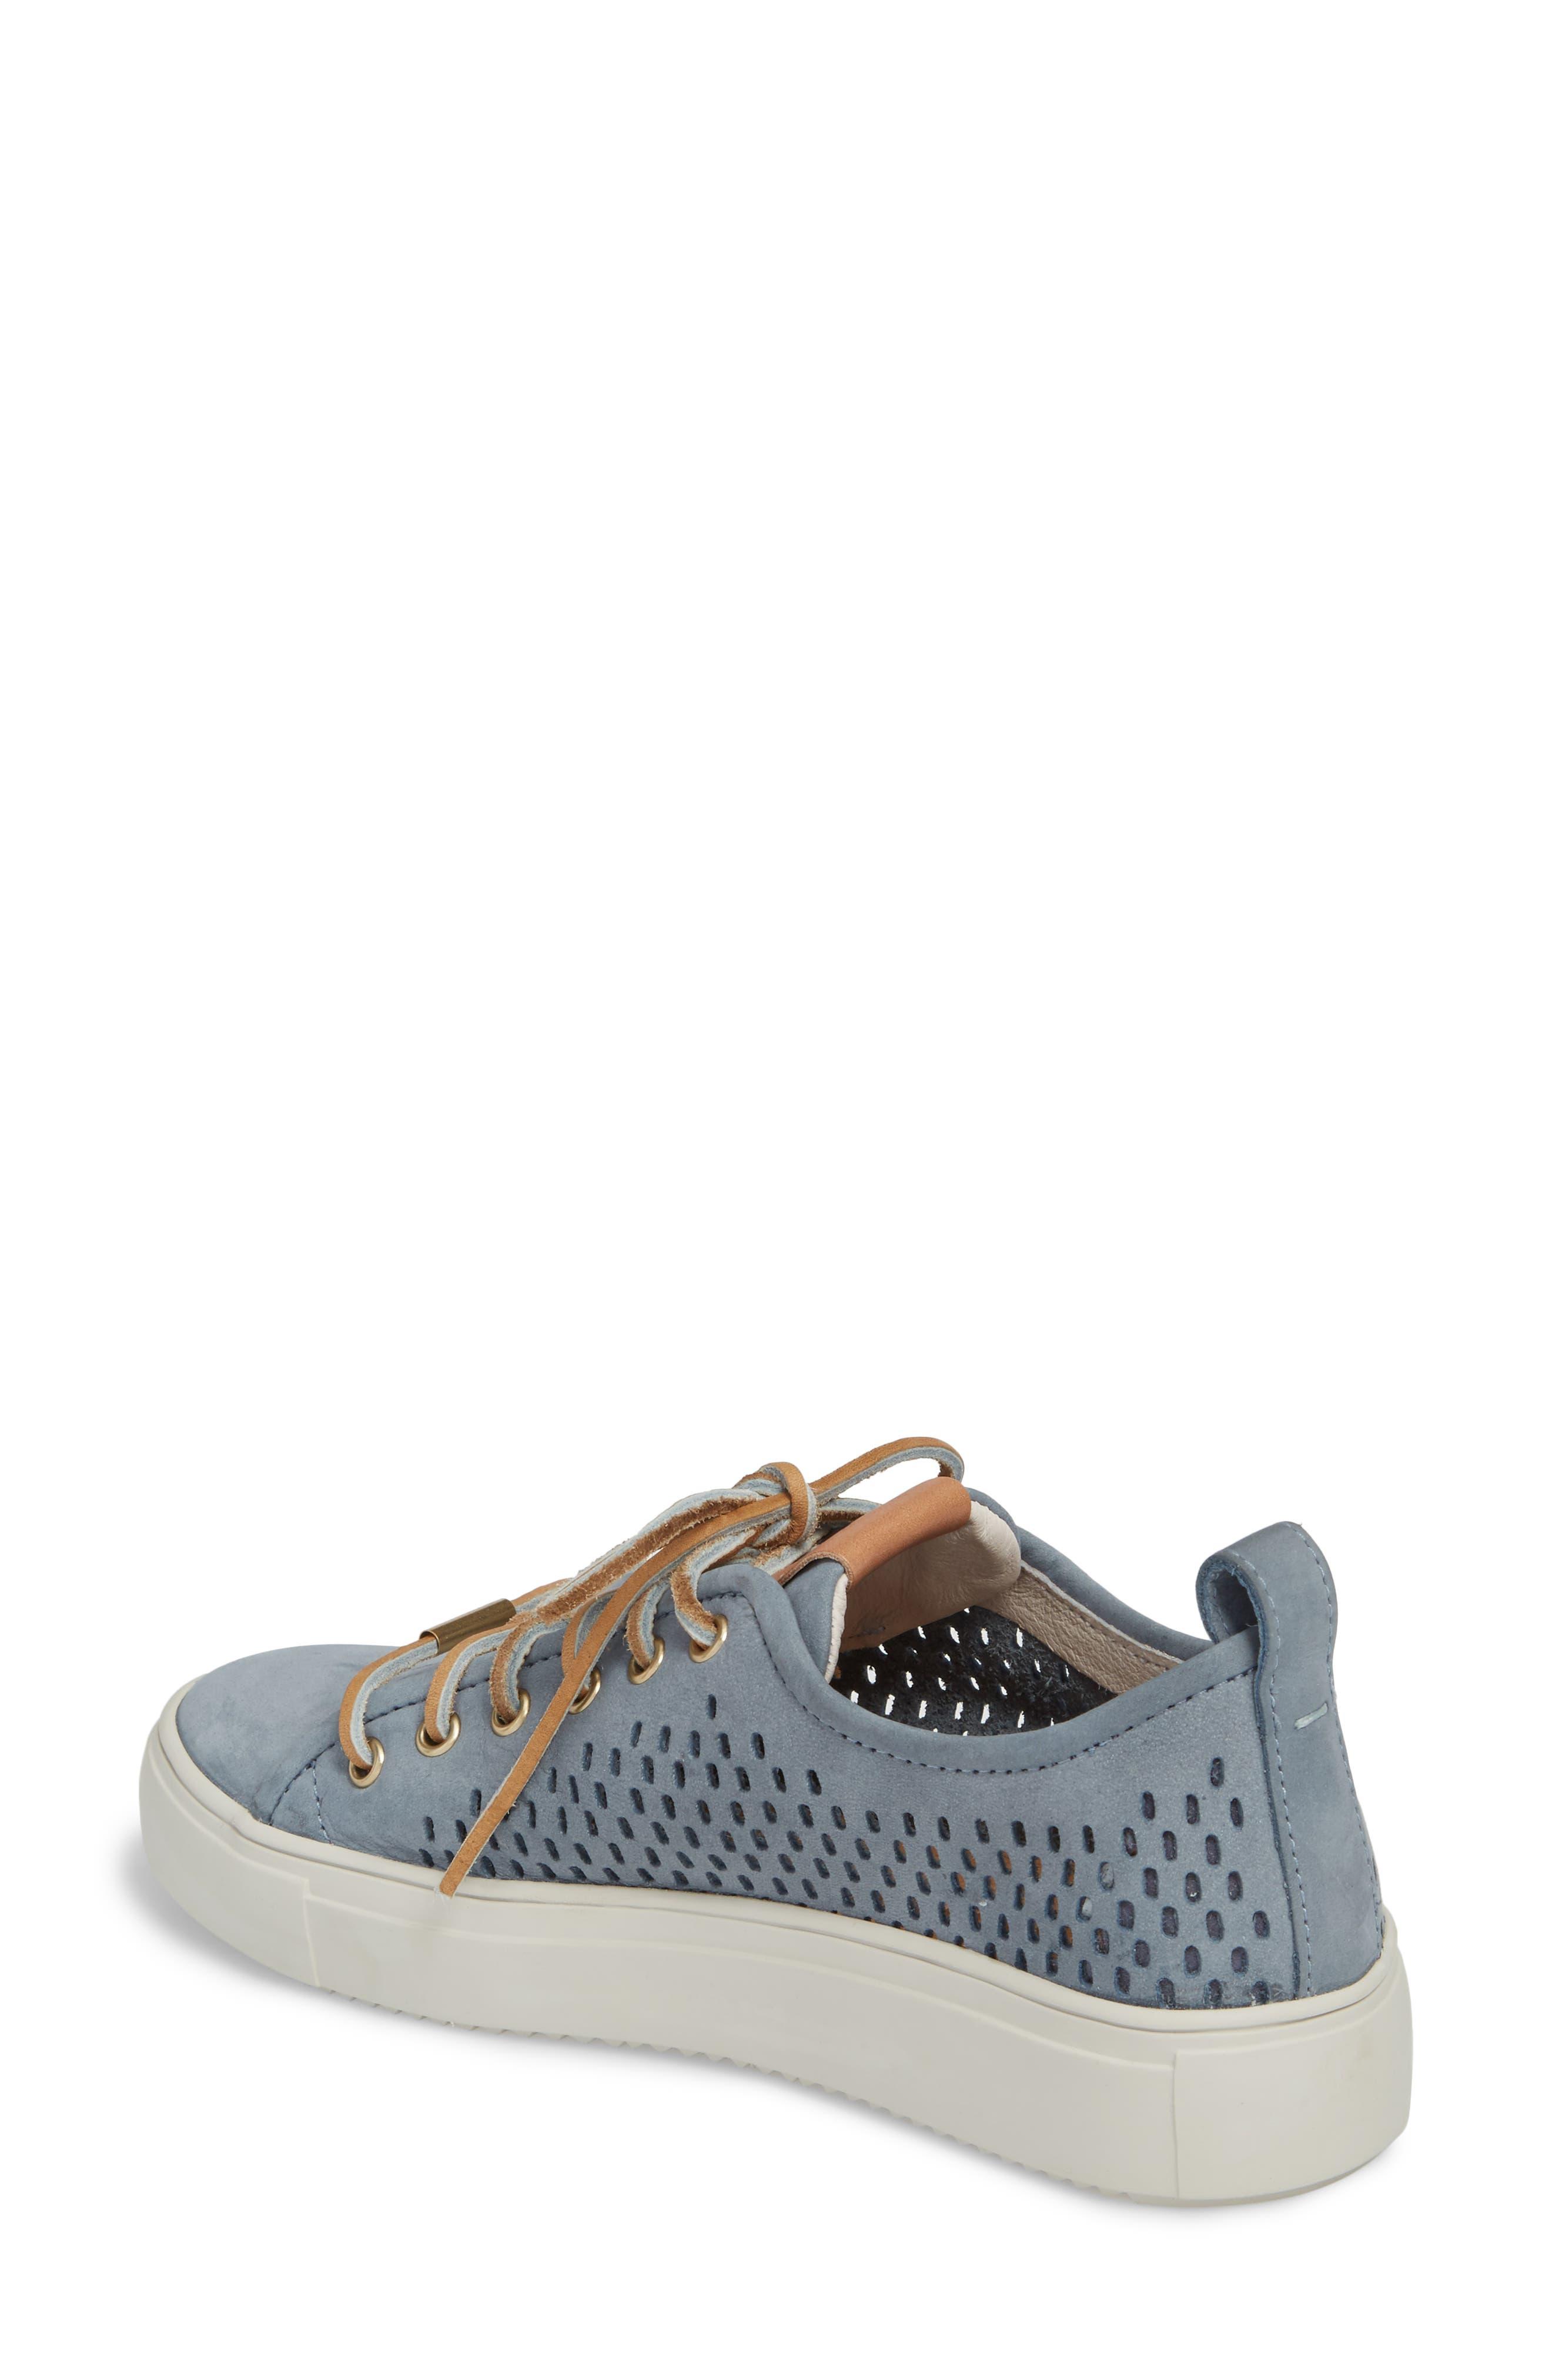 PL87 Sneaker,                             Alternate thumbnail 2, color,                             Winter Sky Leather